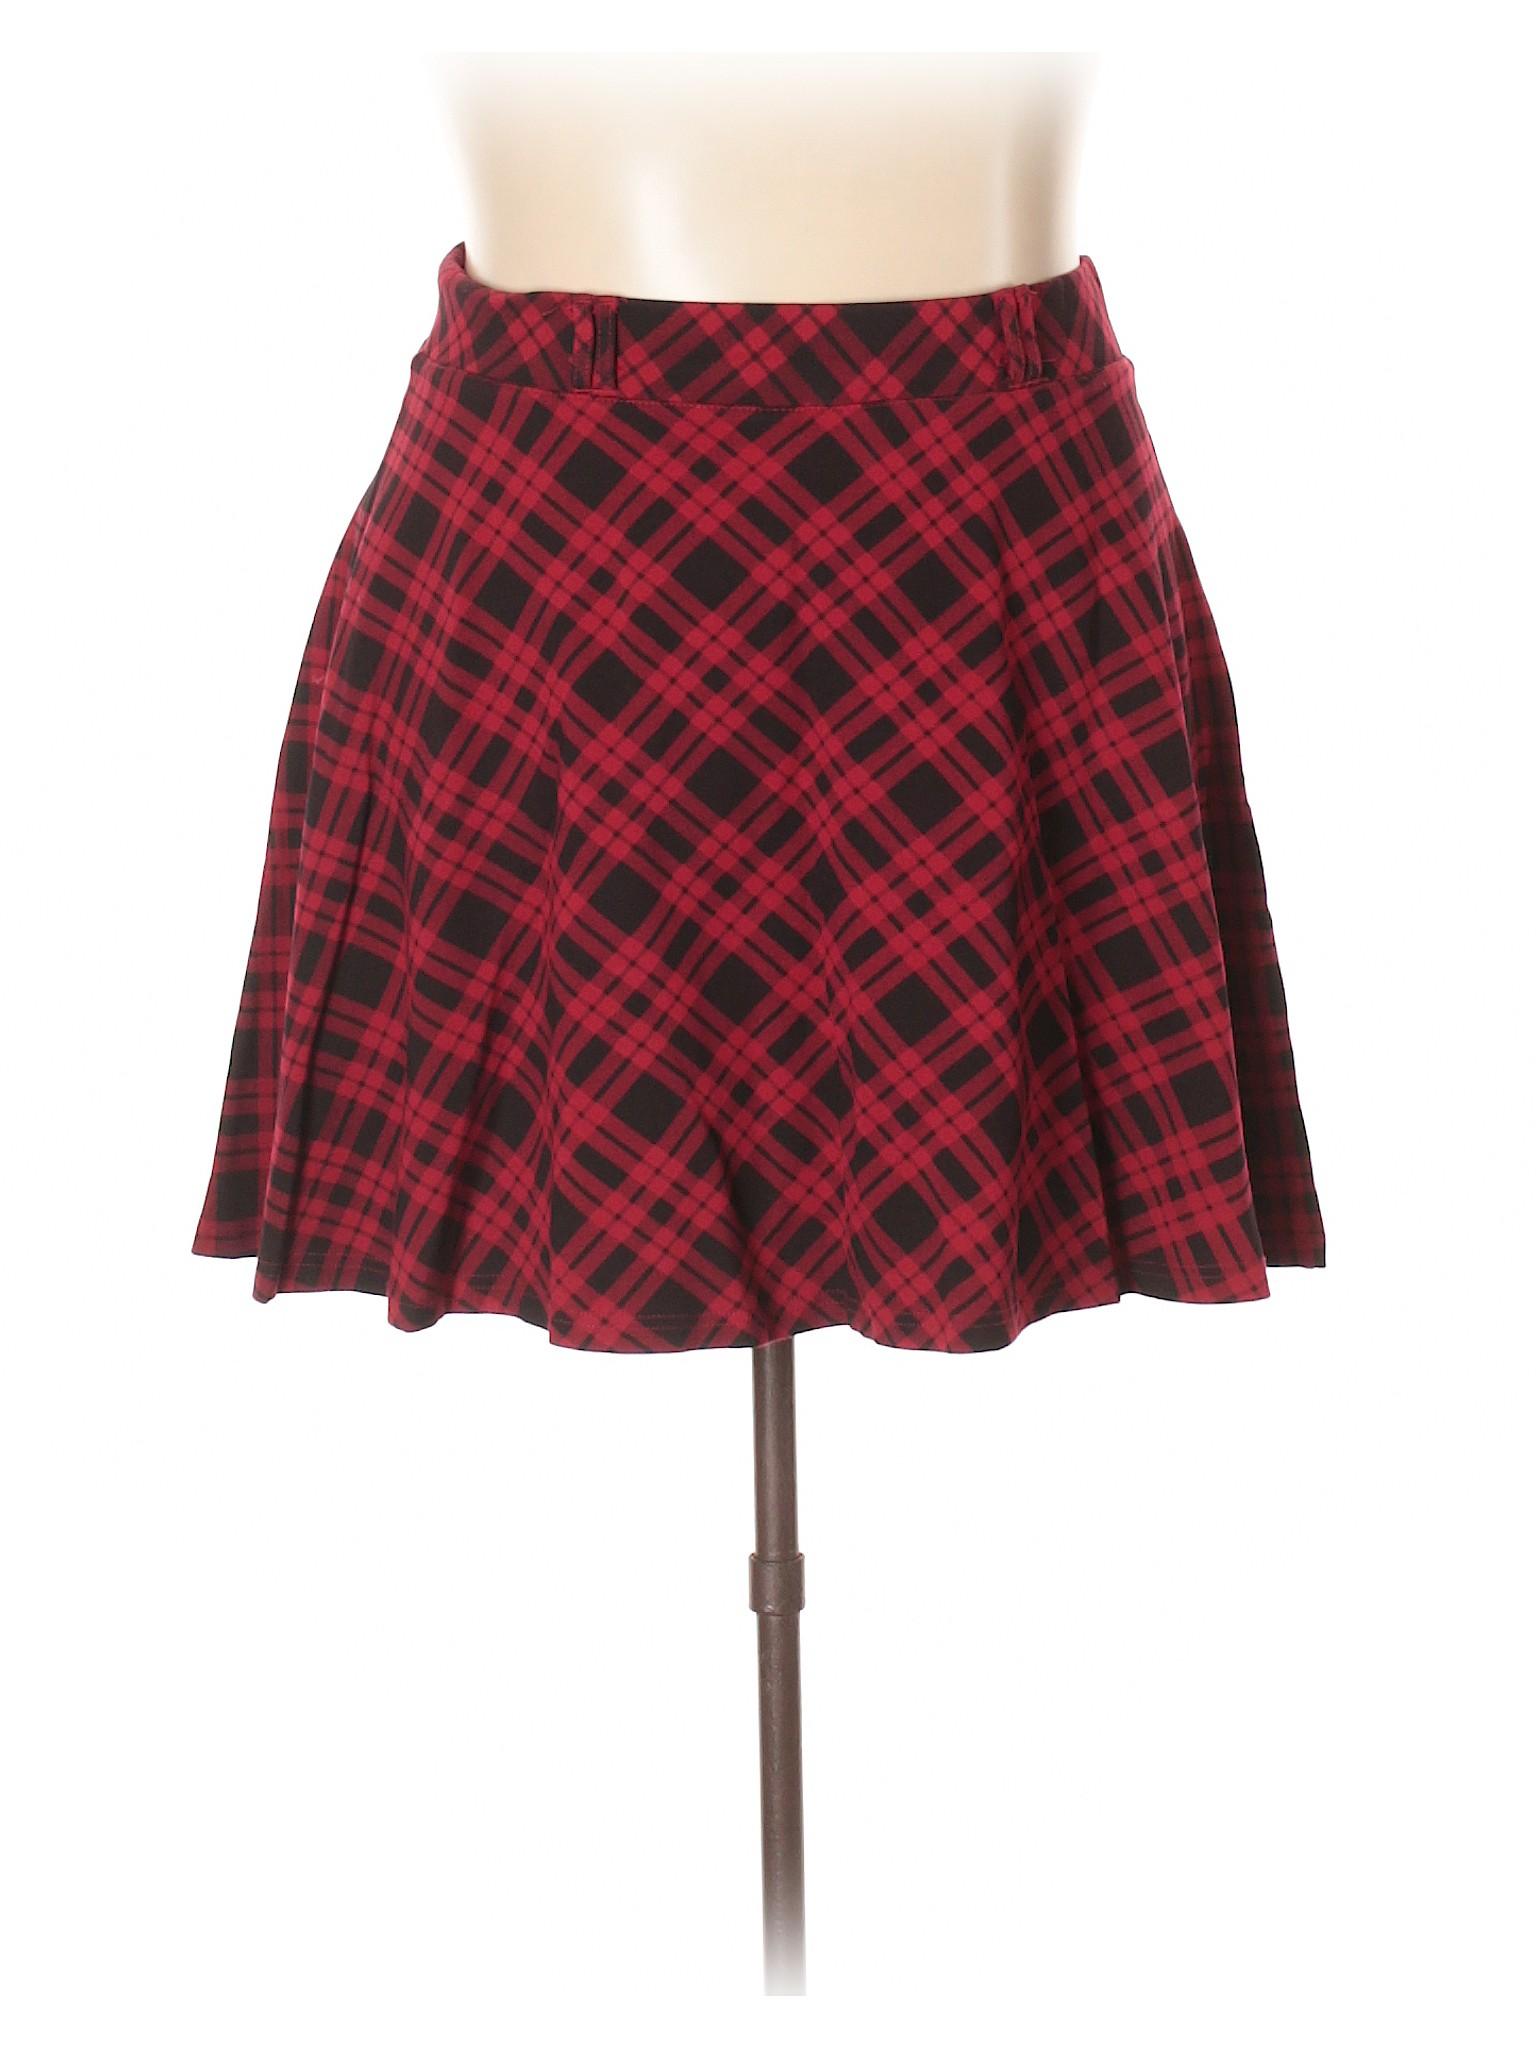 554d3ebc4 Torrid Plus Size Red Tartan Plaid Skirt